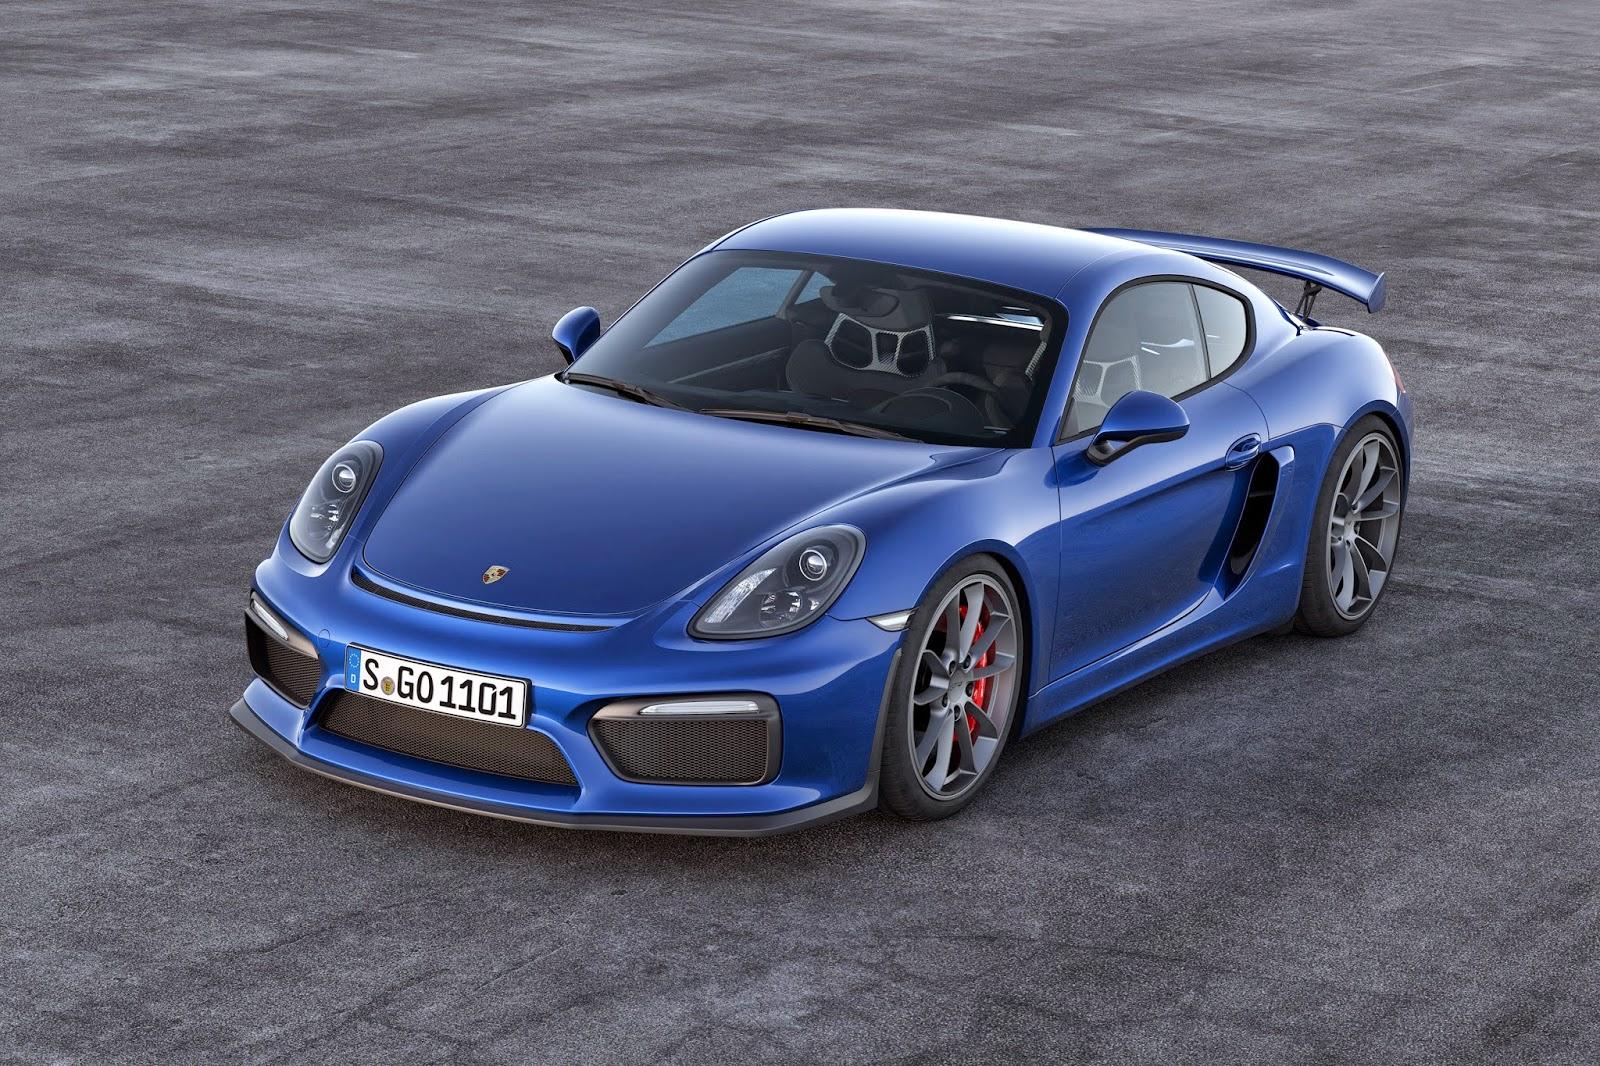 New Porsche Cayman GT4 Vs. Used '997' 911 GT3 [w/Poll